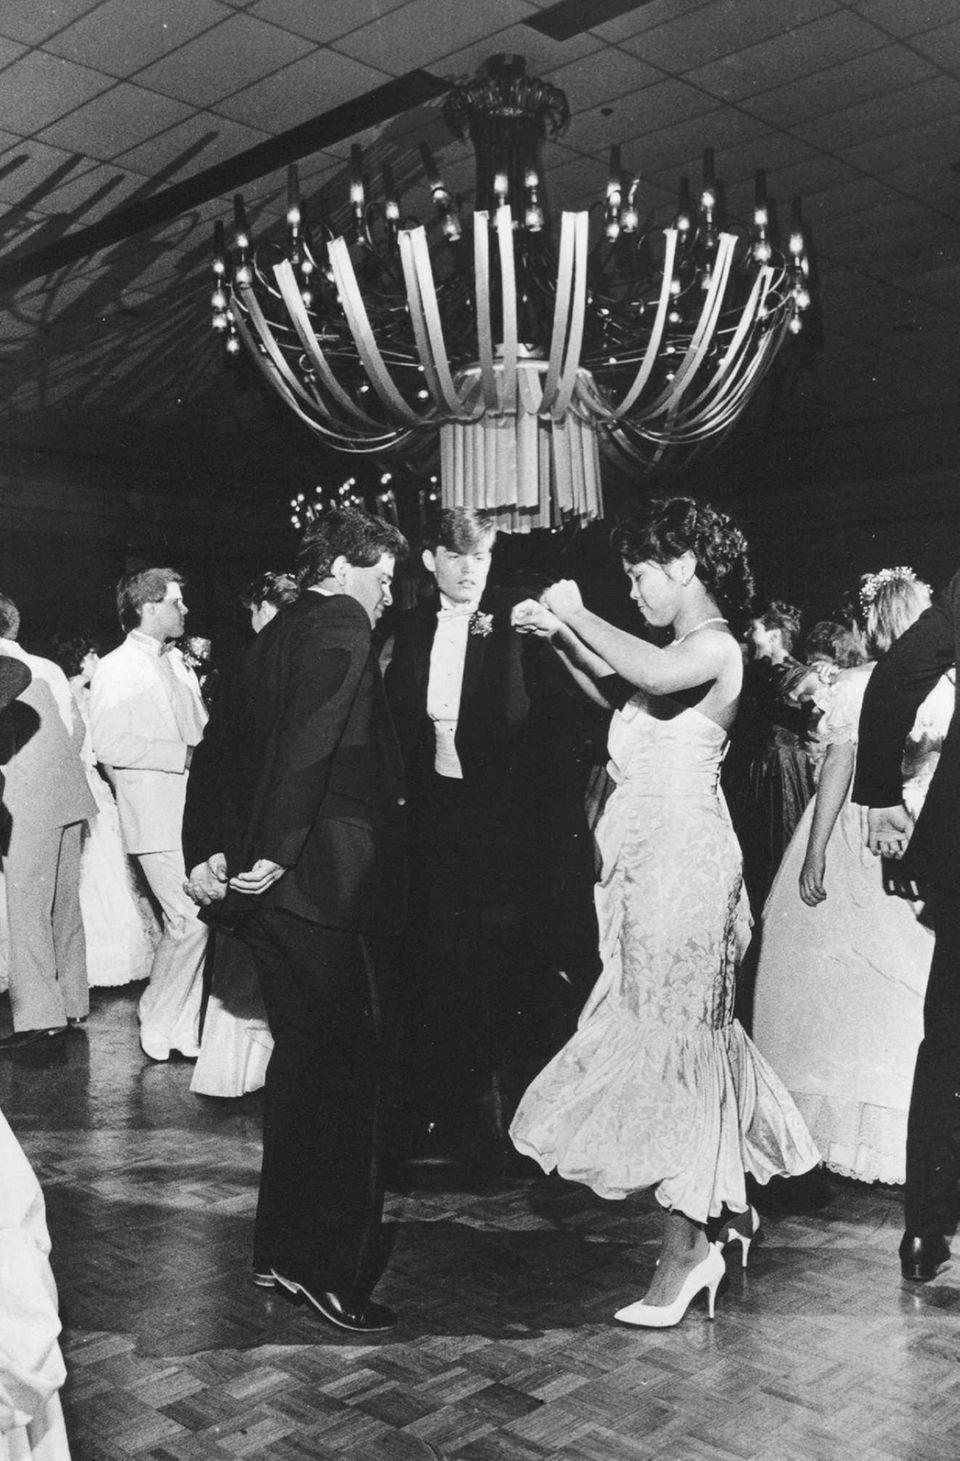 Guy Bebedetto and Sharon Aguam dance at Sachem